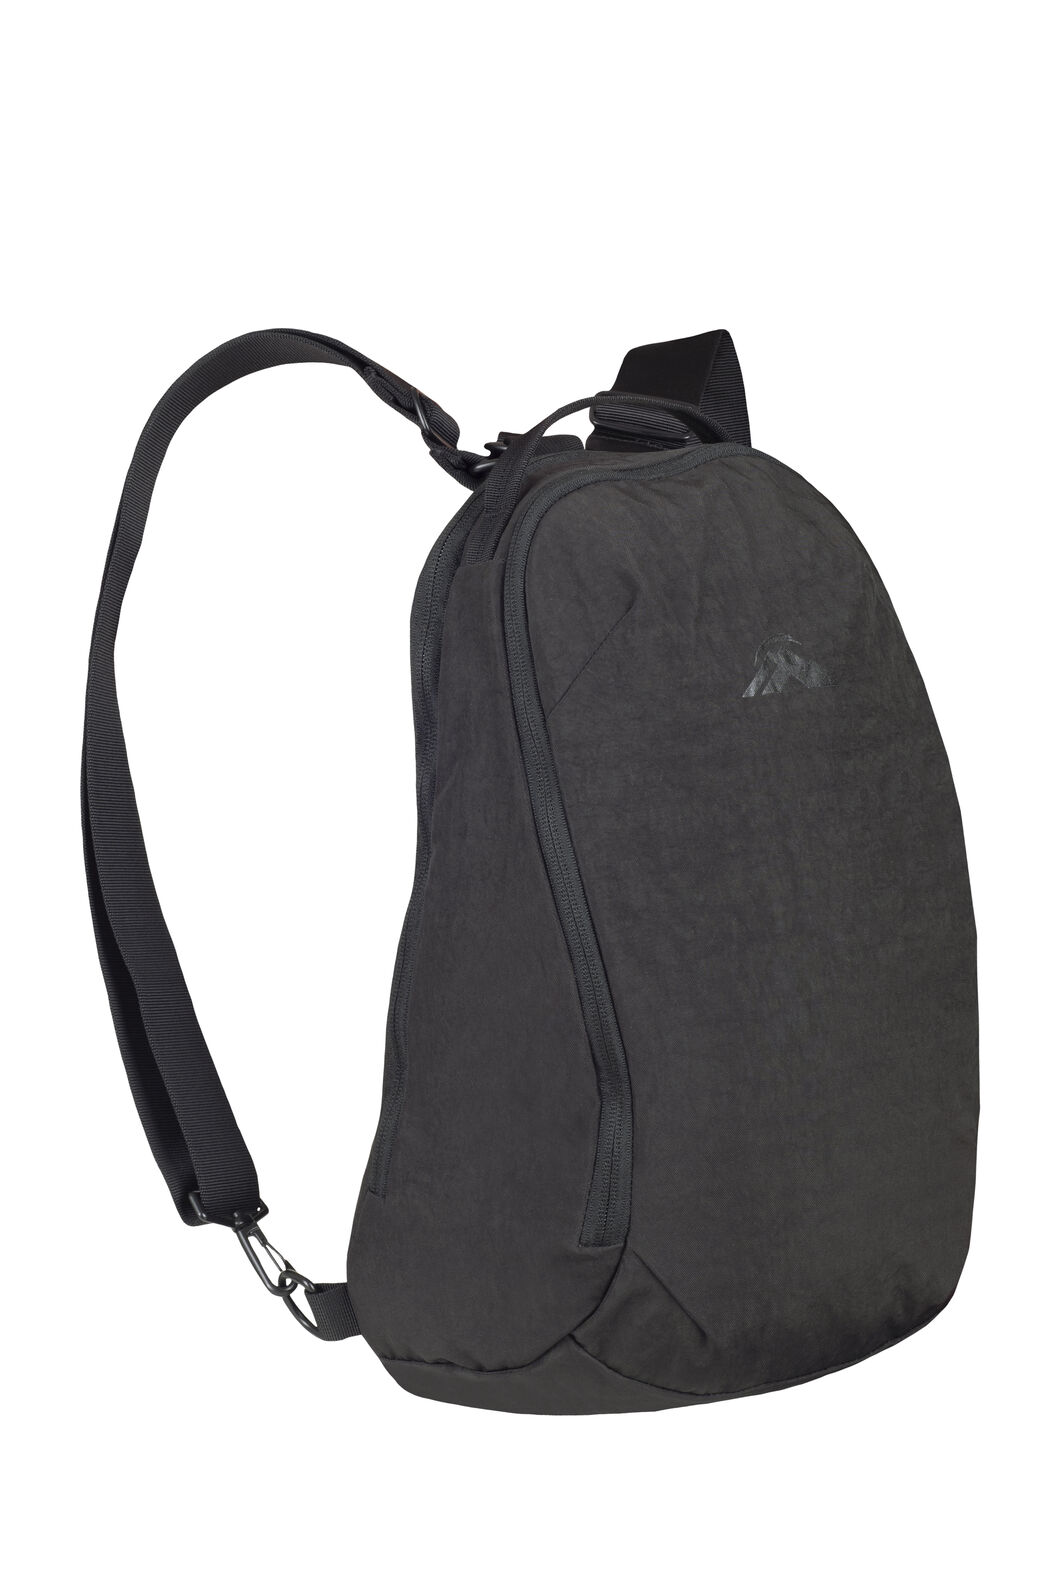 Macpac Sidekick 10L Sling Pack, Black, hi-res